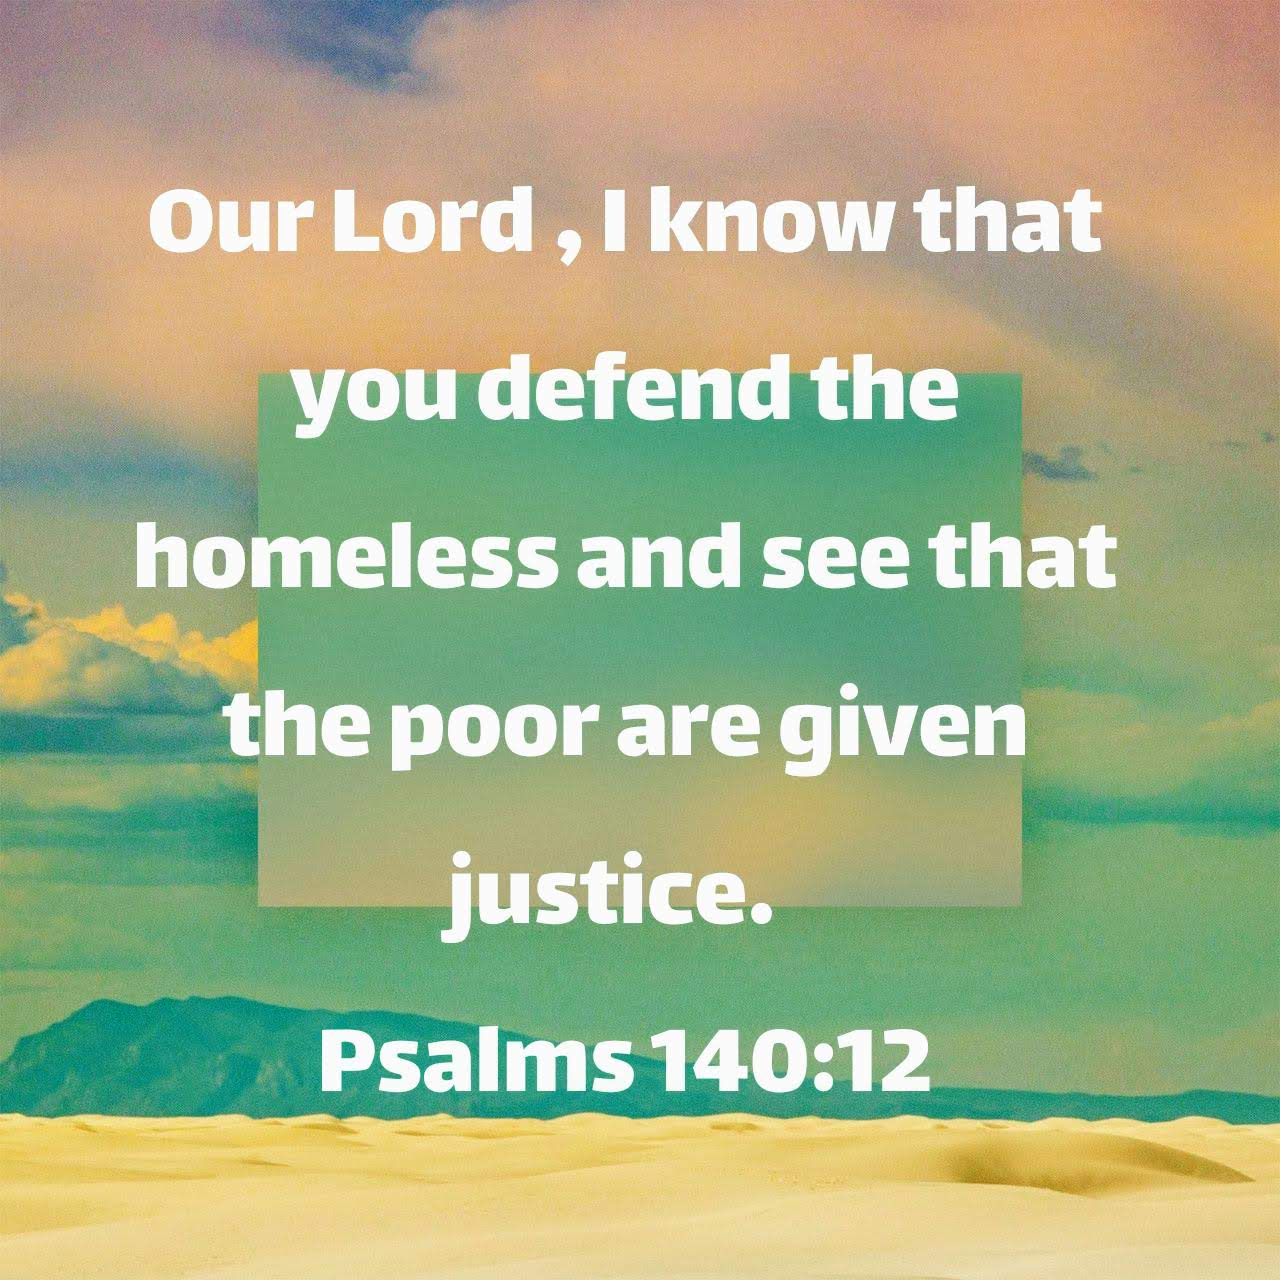 Psalm 140:12